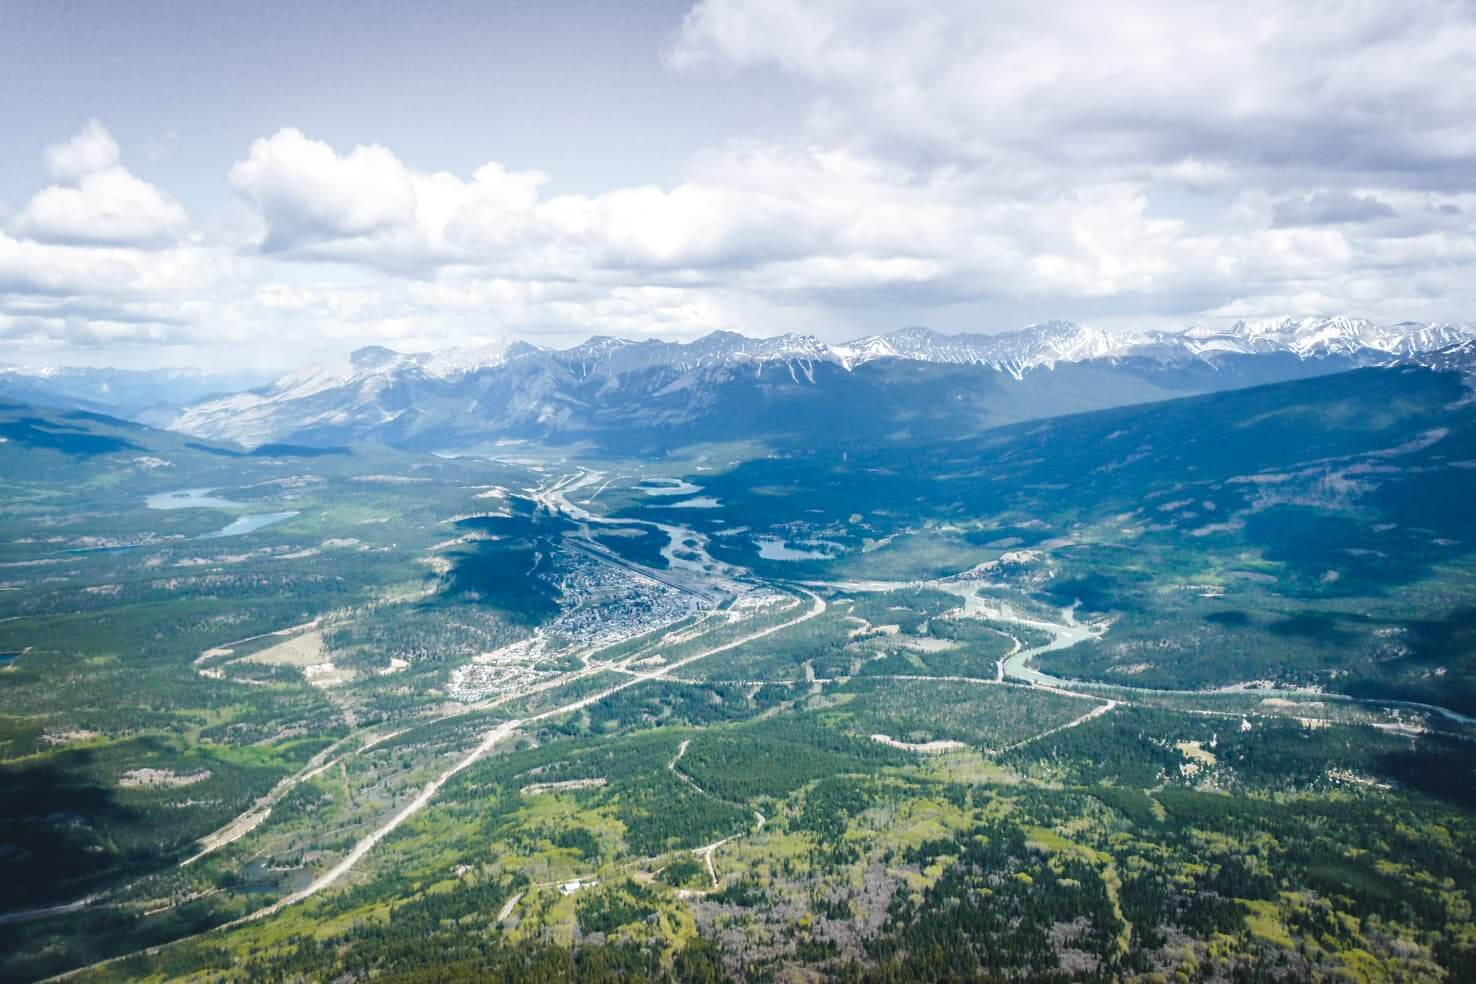 Adventure travel guide to Jasper National Park - town of Jasper